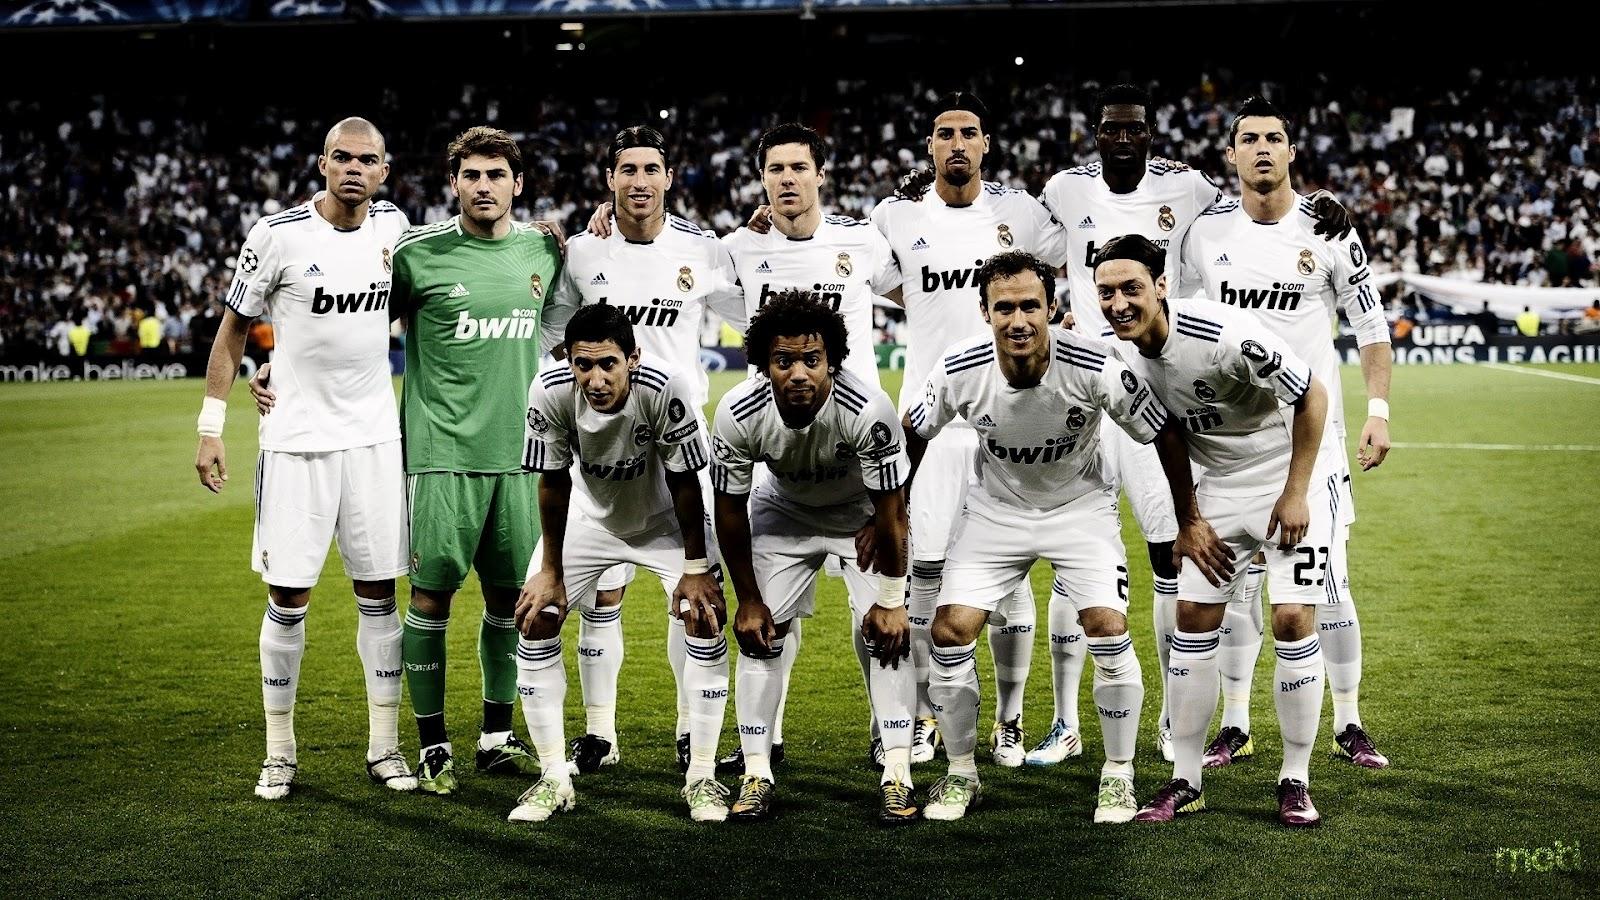 http://1.bp.blogspot.com/-jH9ipyQjZN8/T6-WnvKzODI/AAAAAAAADdM/wVkI_r6hg0s/s1600/Real+Madrid+Wallpaper+2.jpg